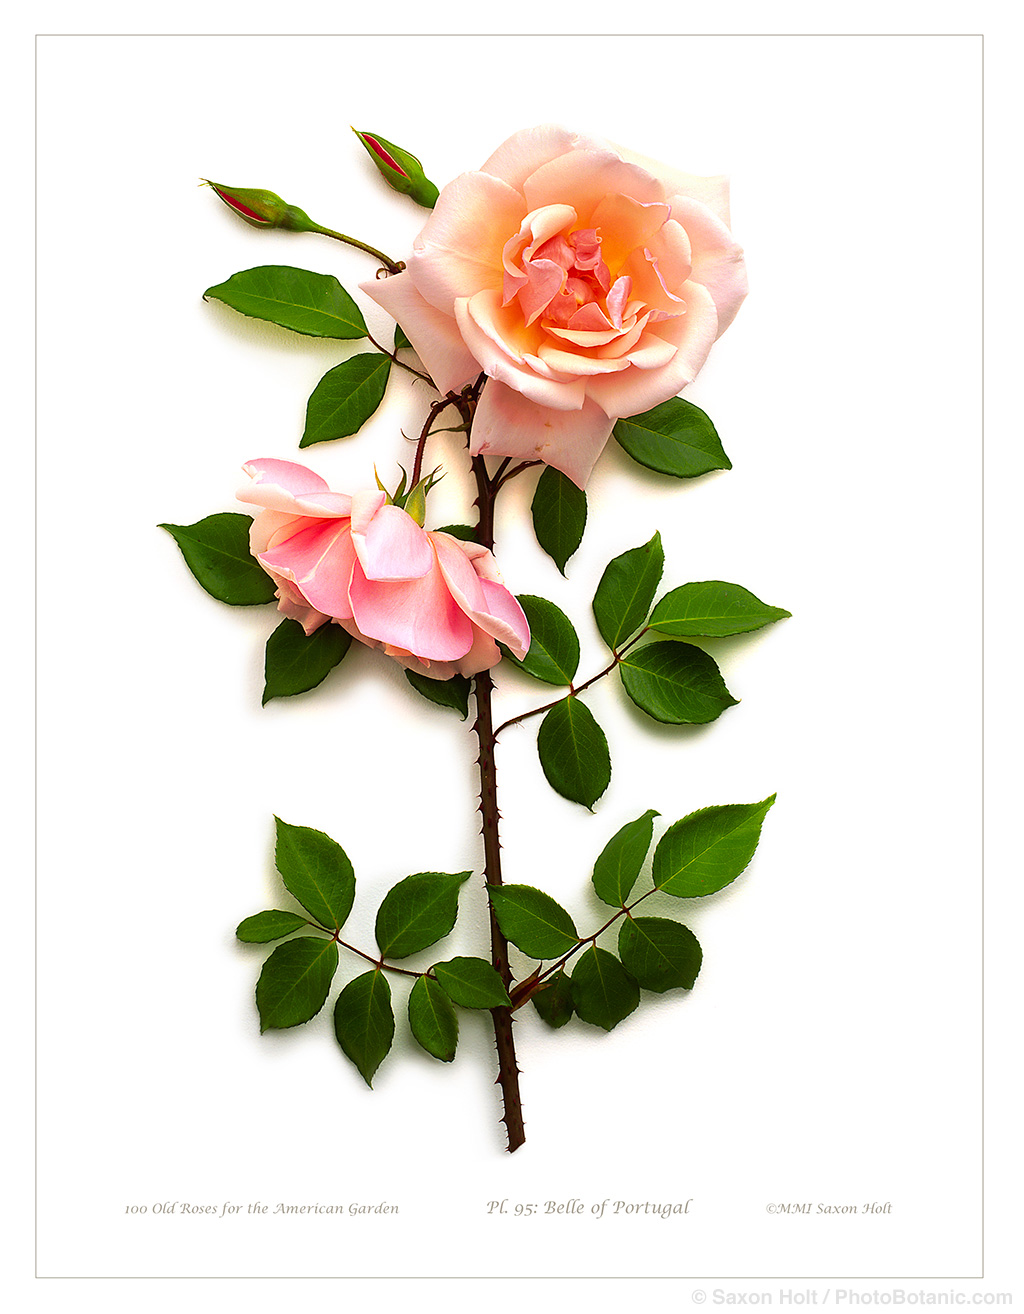 belle of portugal rose; smith & hawken photobotanic art print